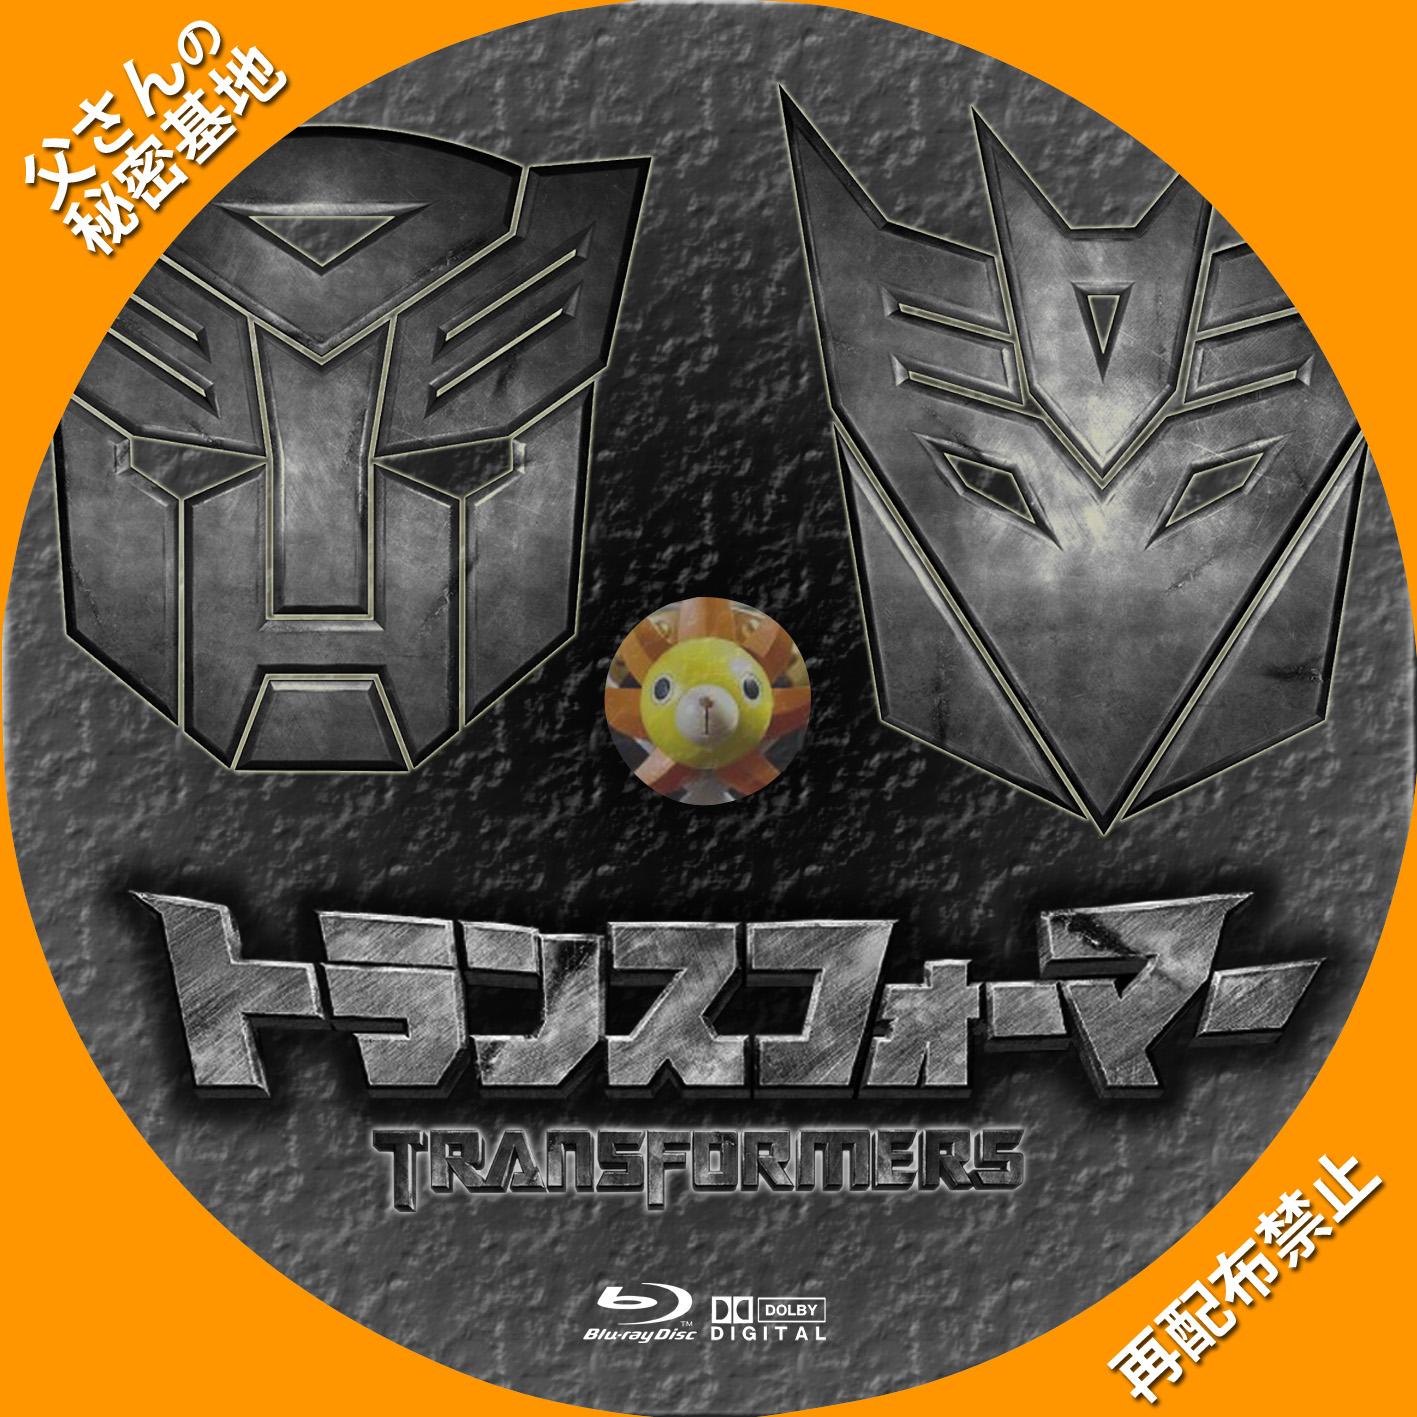 transformers_BD_03.jpg